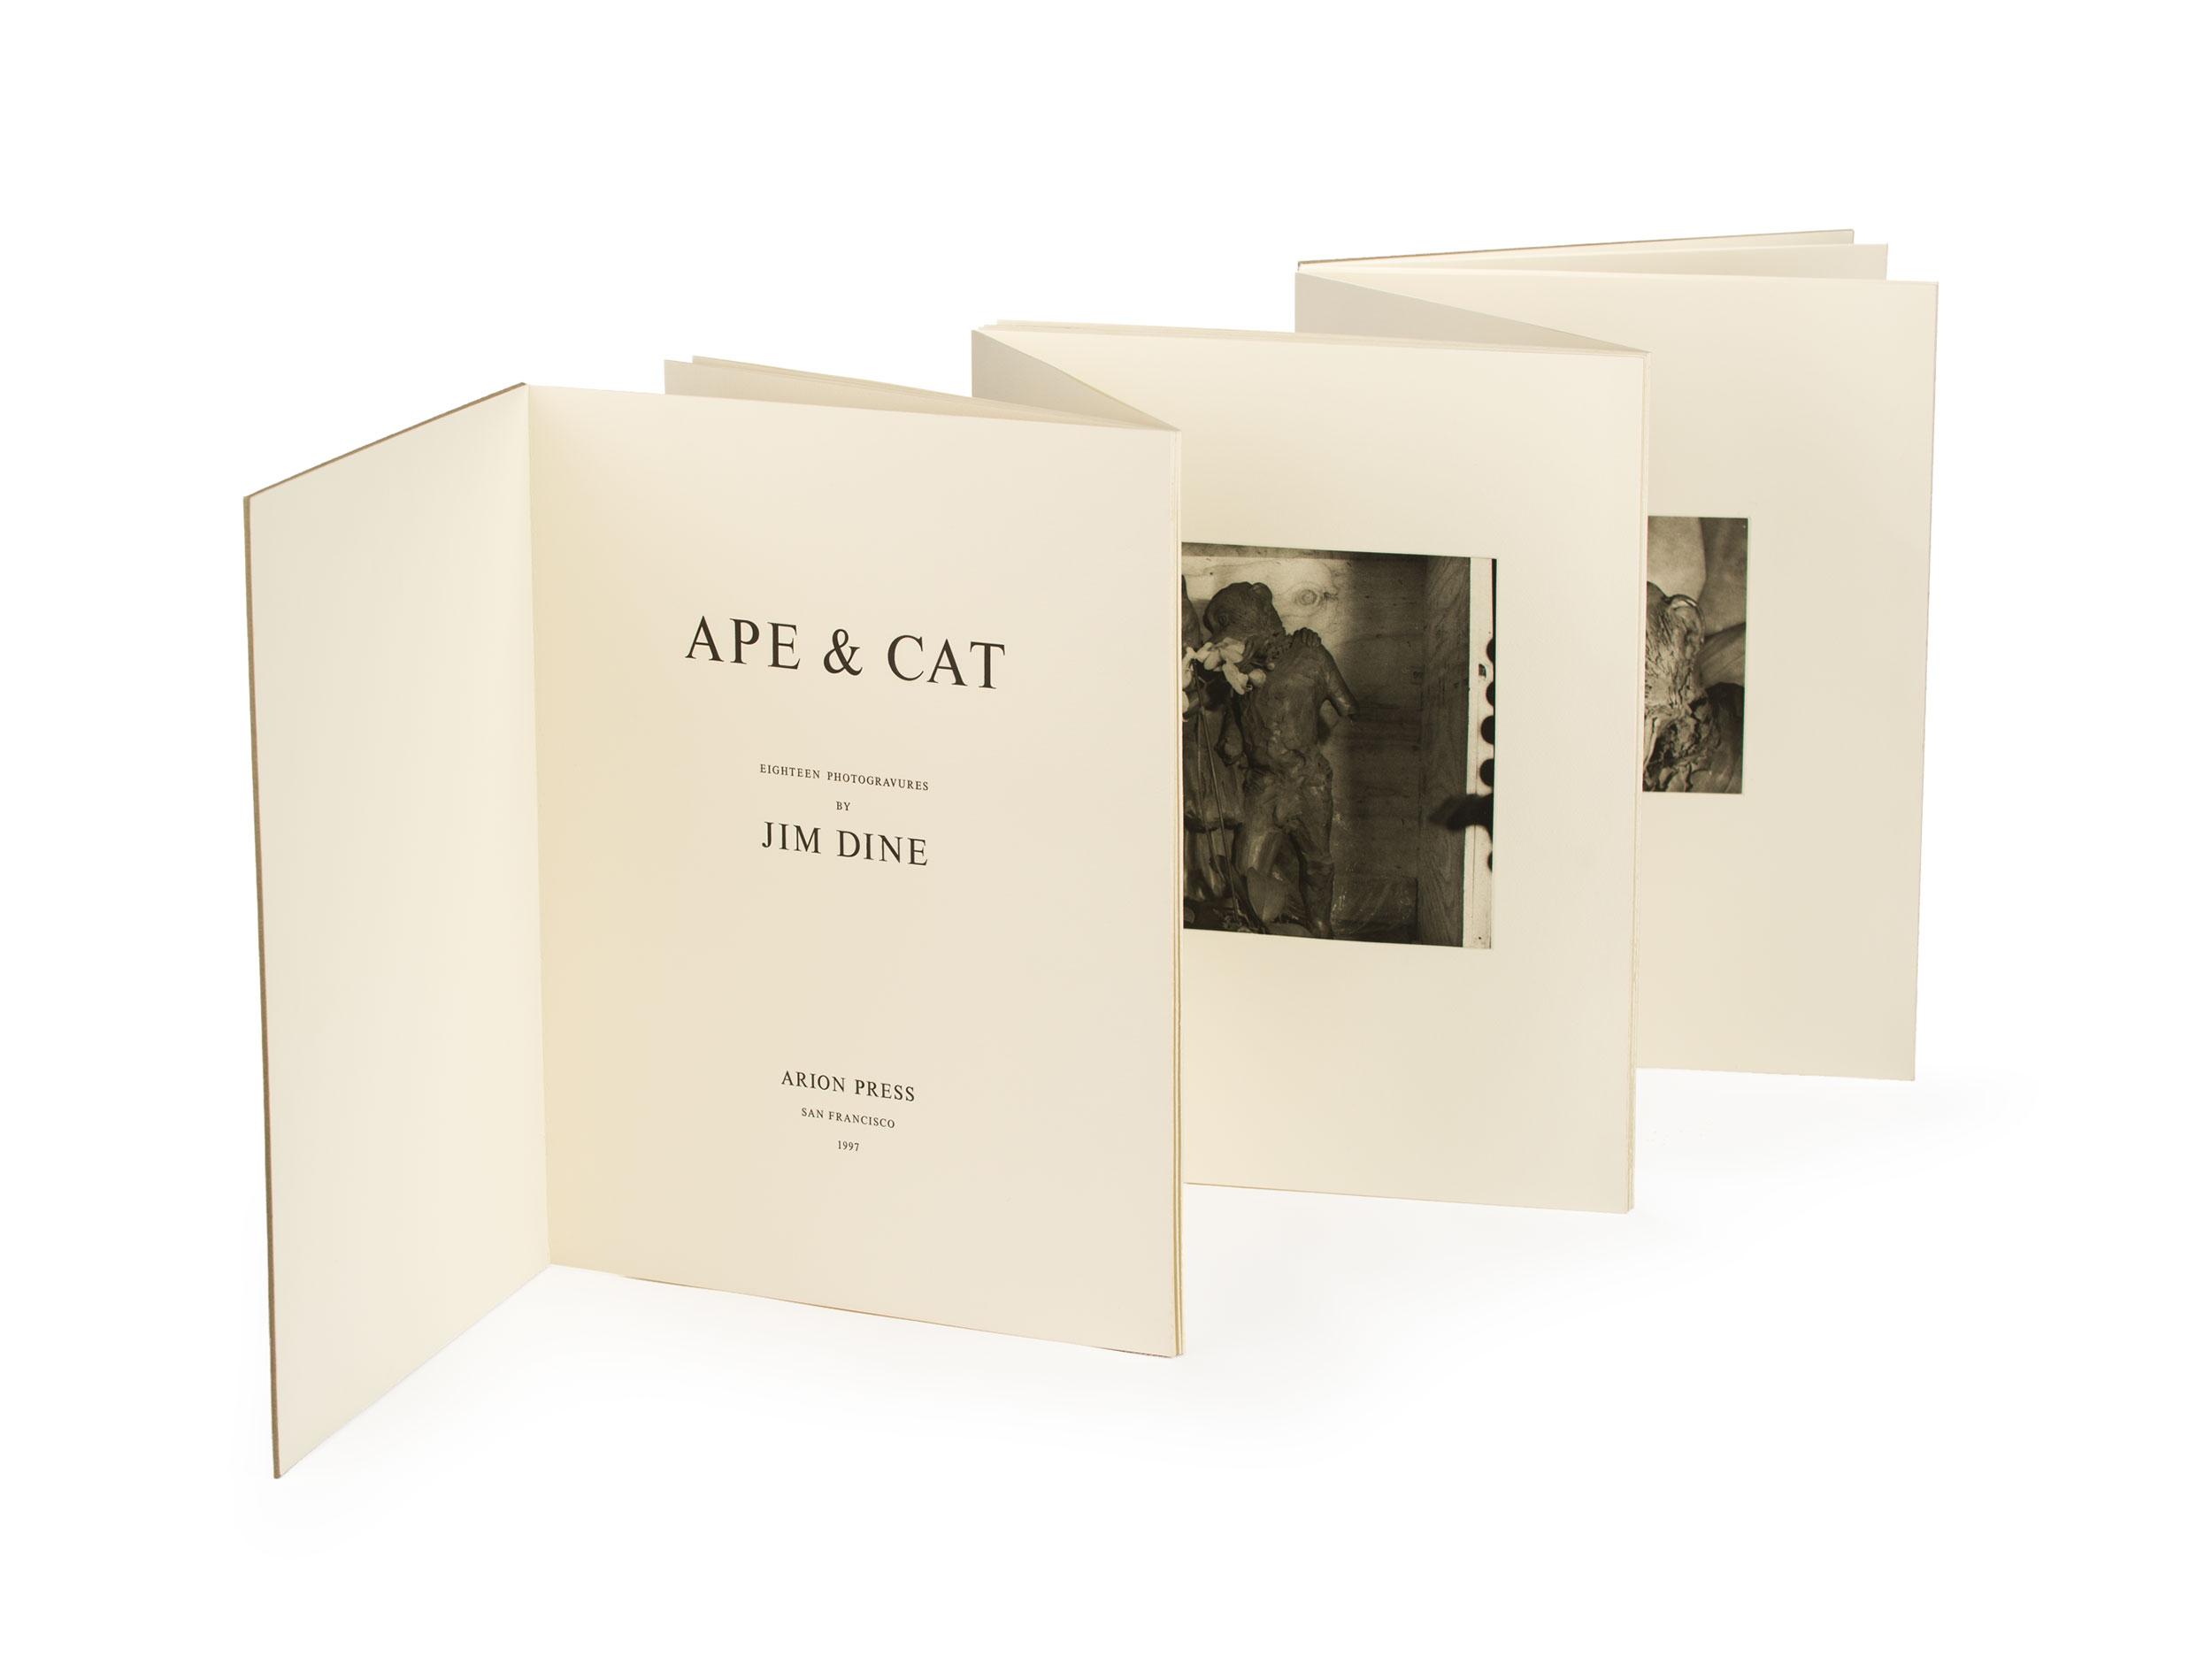 052_Ape-&-Cat-Accordion-02-fix.jpg